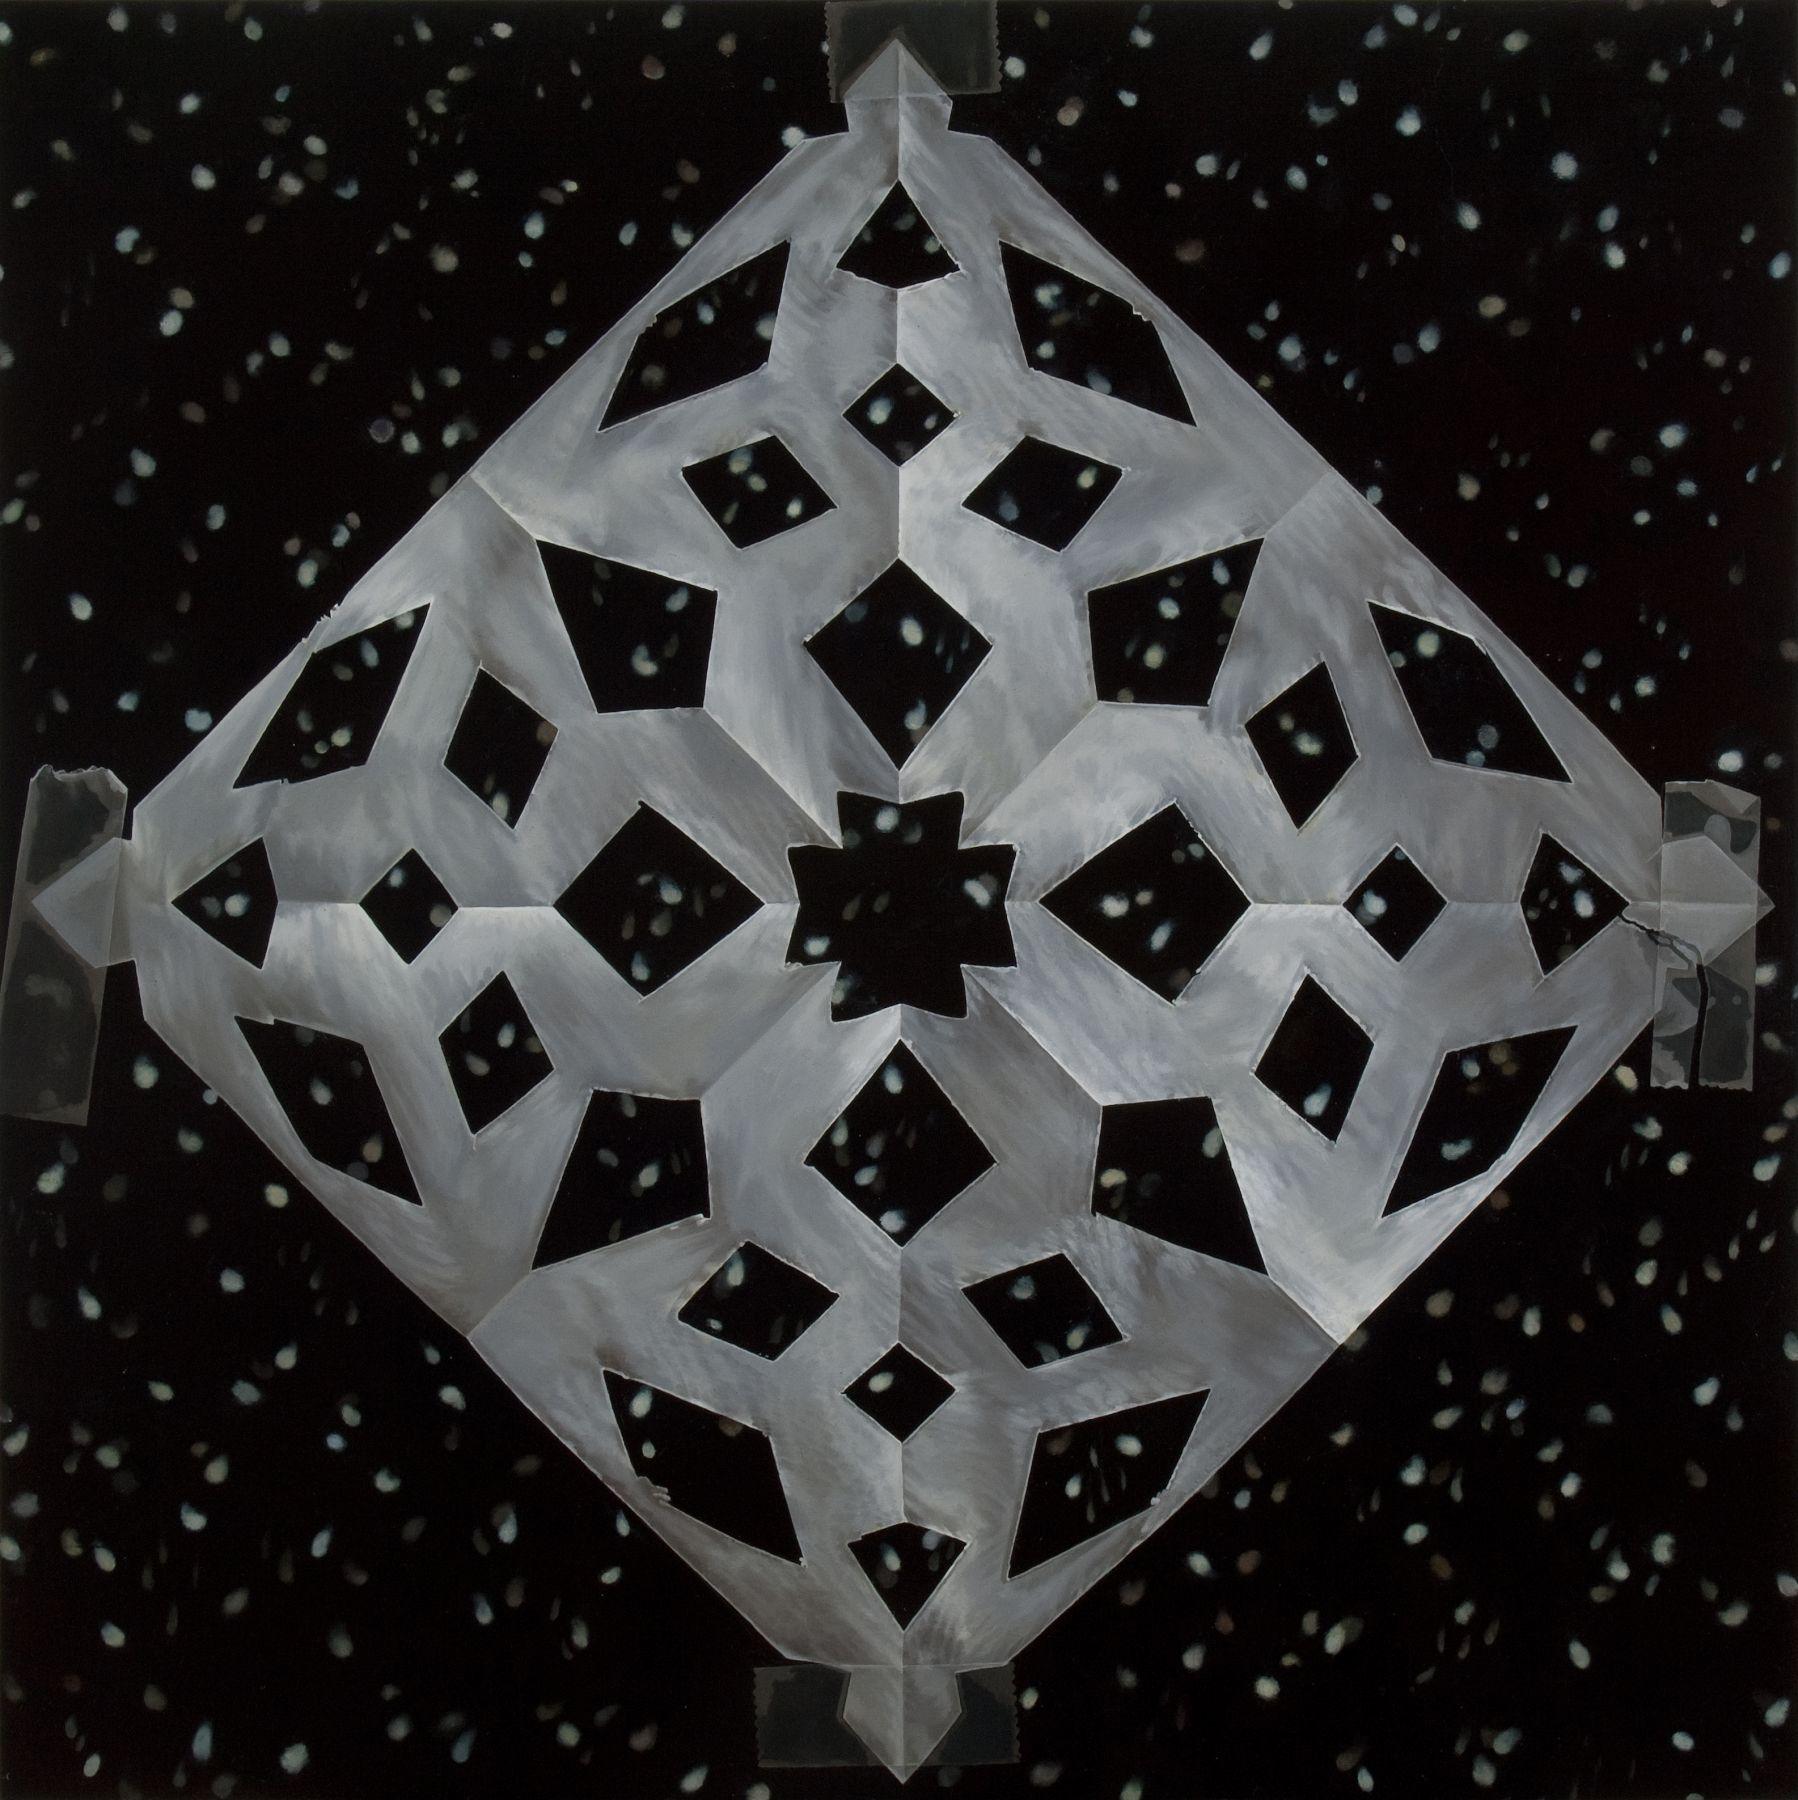 Snowflakes 2011 oil on canvas